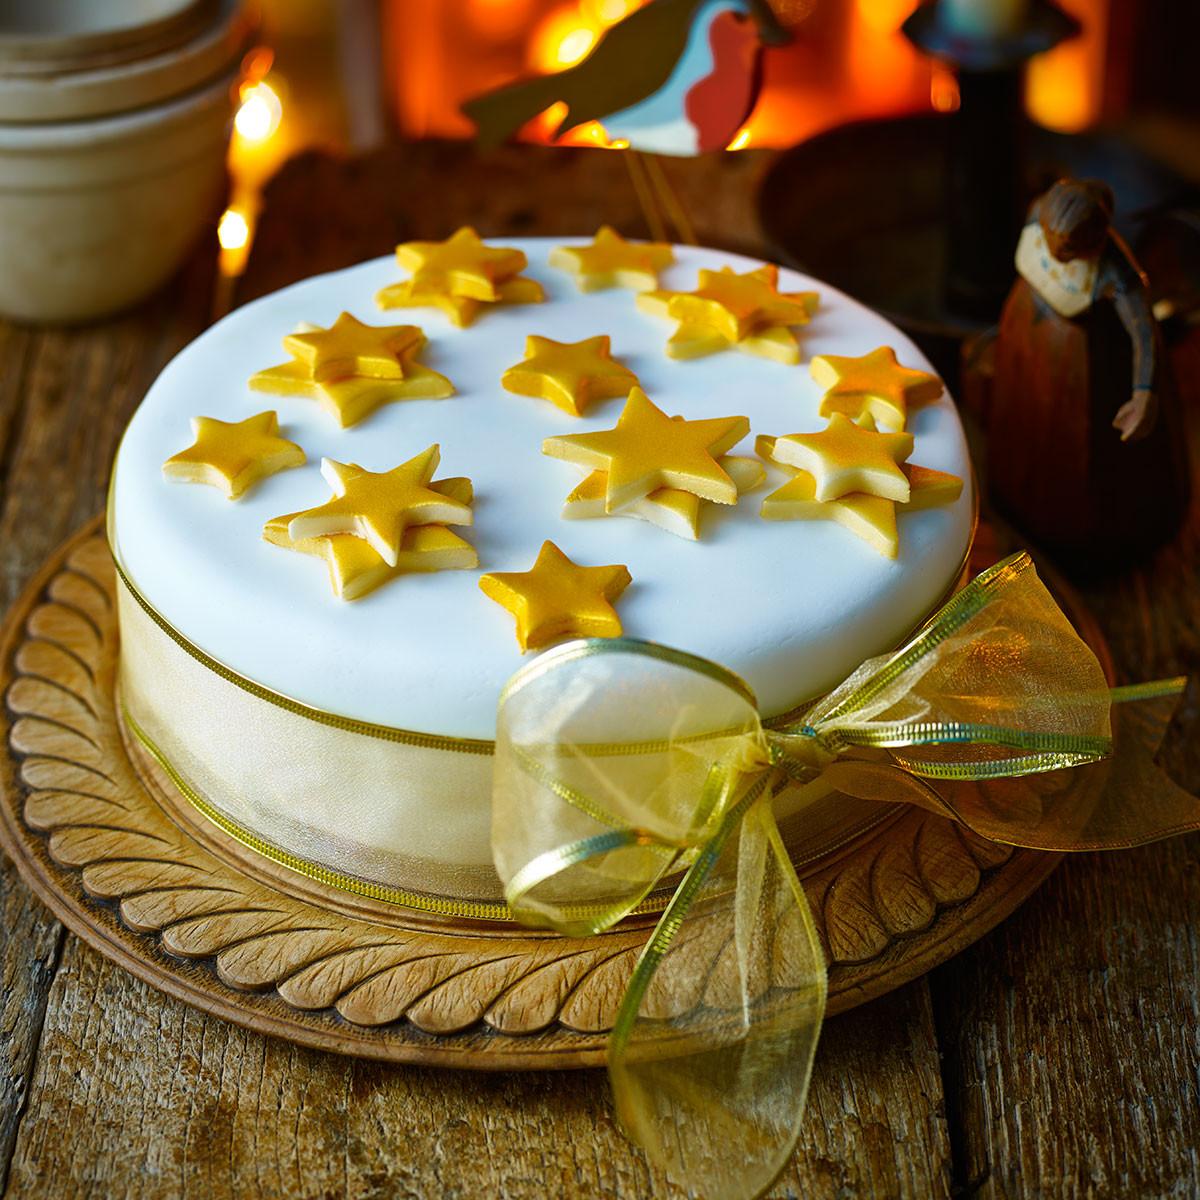 Simple Christmas Cakes  Simple iced Christmas cake Good Housekeeping